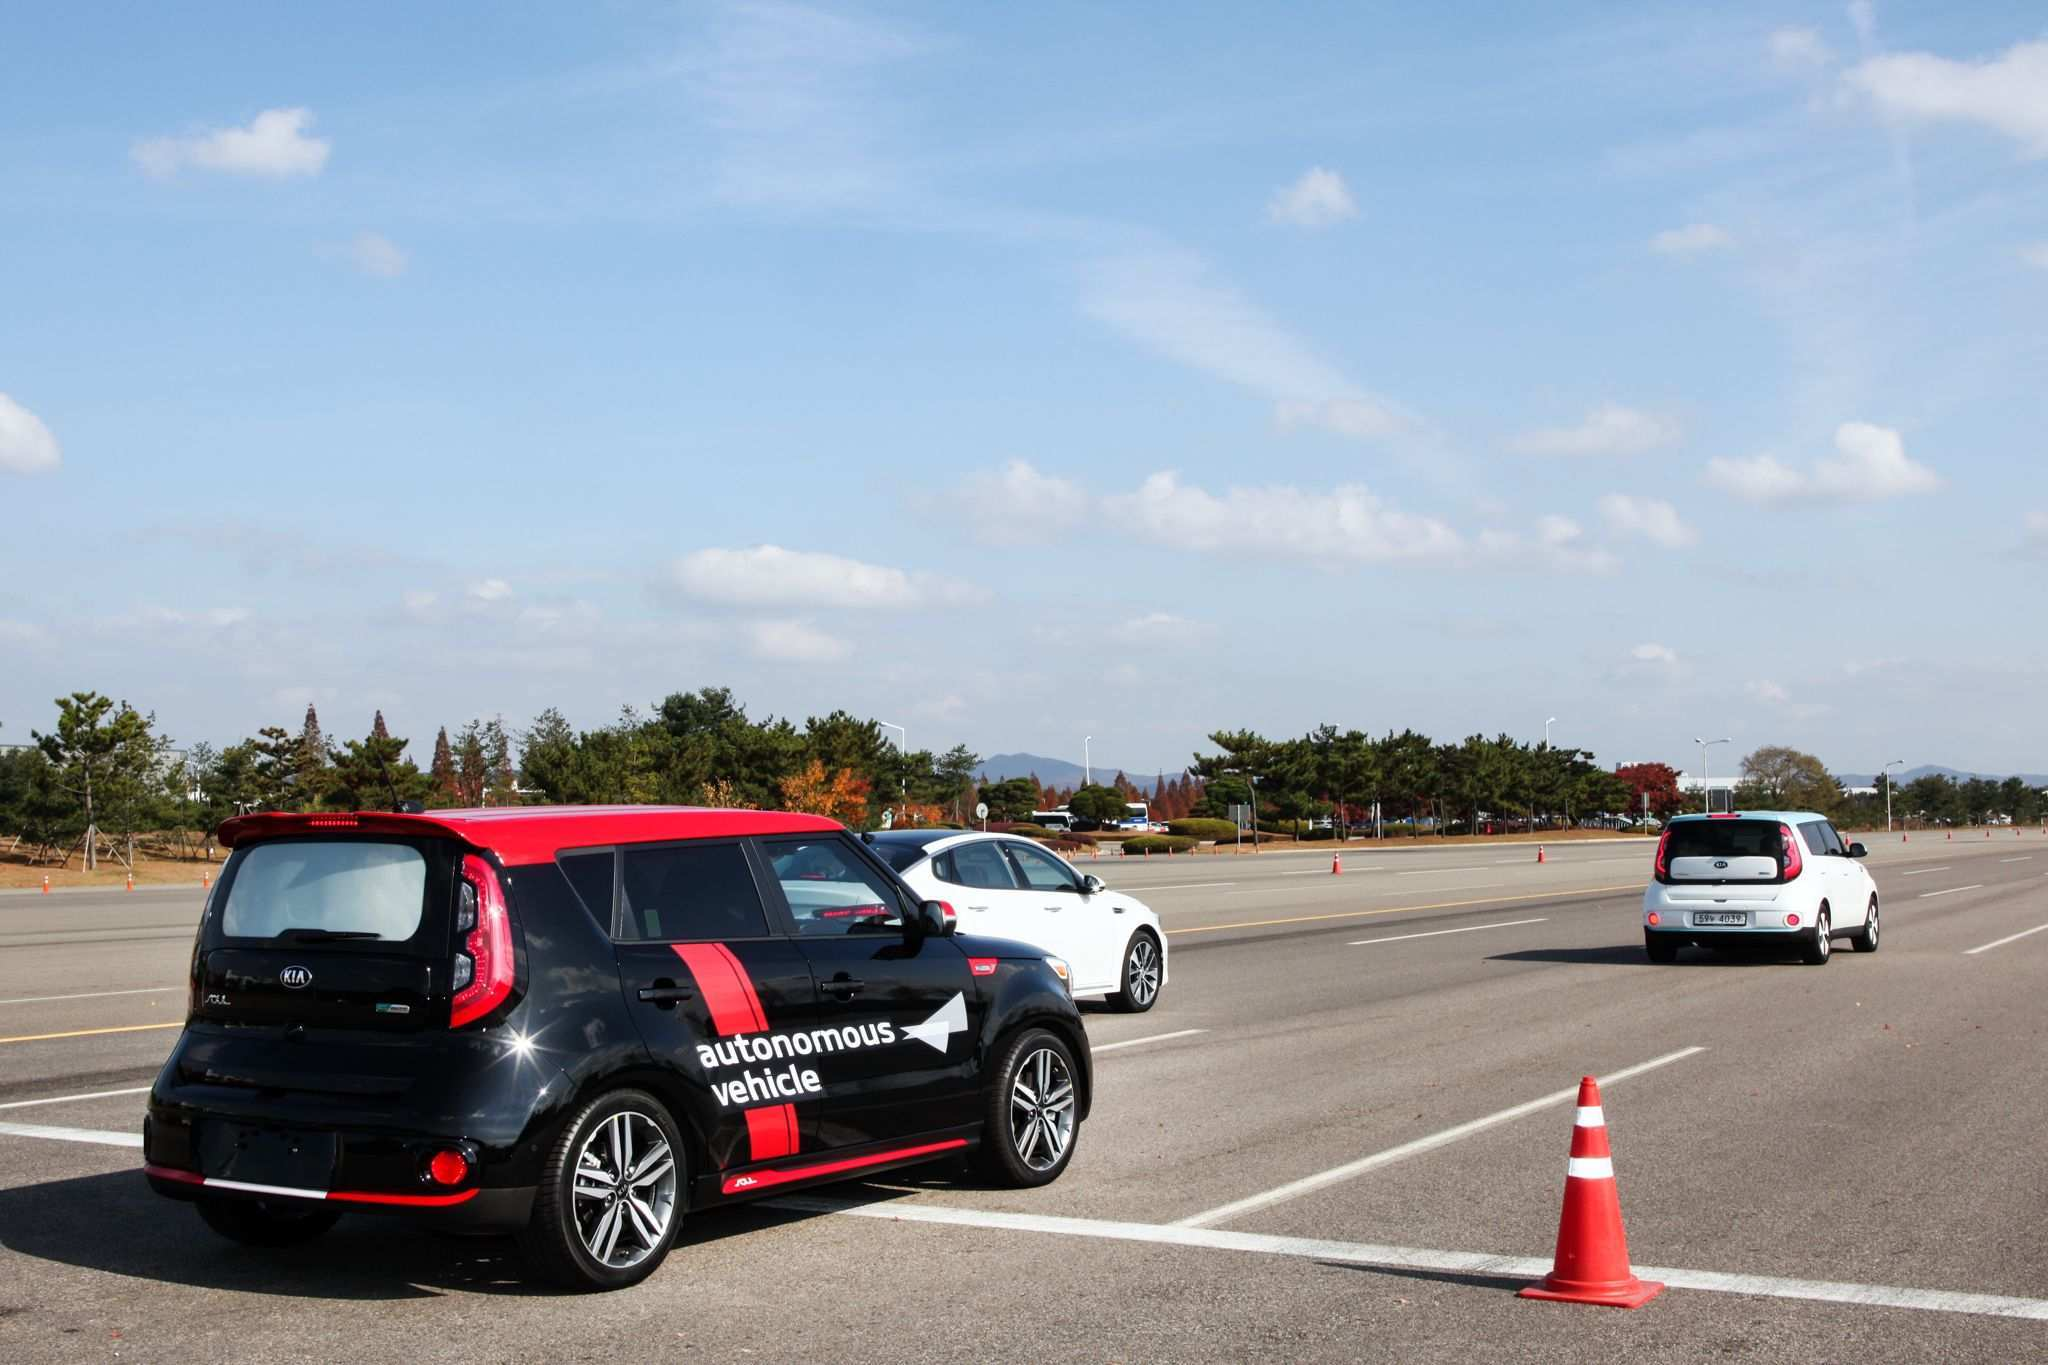 59 New Kia Autonomous 2020 Overview by Kia Autonomous 2020